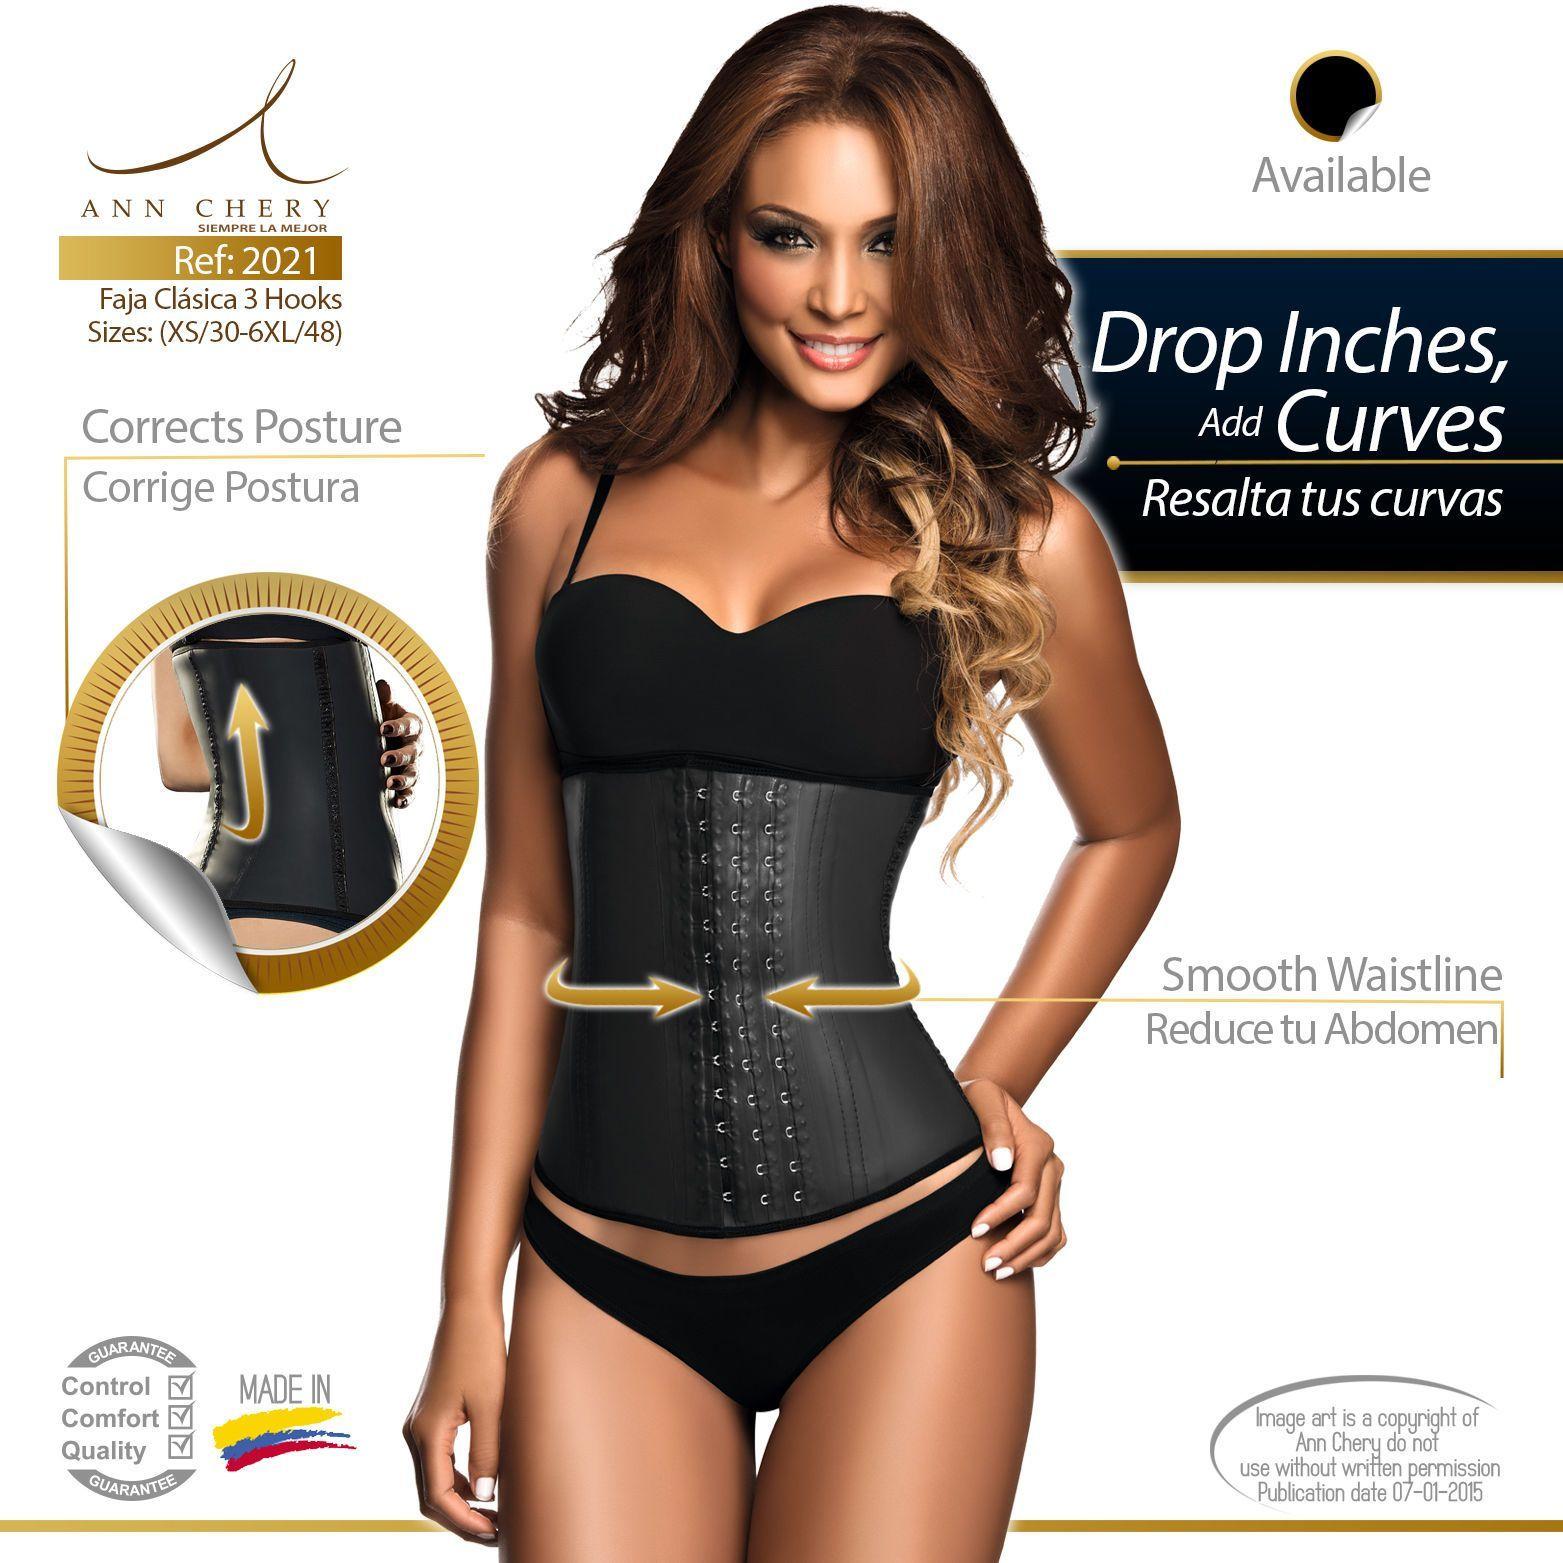 ac4caa5ff Ann Chery 2021 3 Hooks Black Latex Colombian Girdle Waist Cincher Faja  Colombian